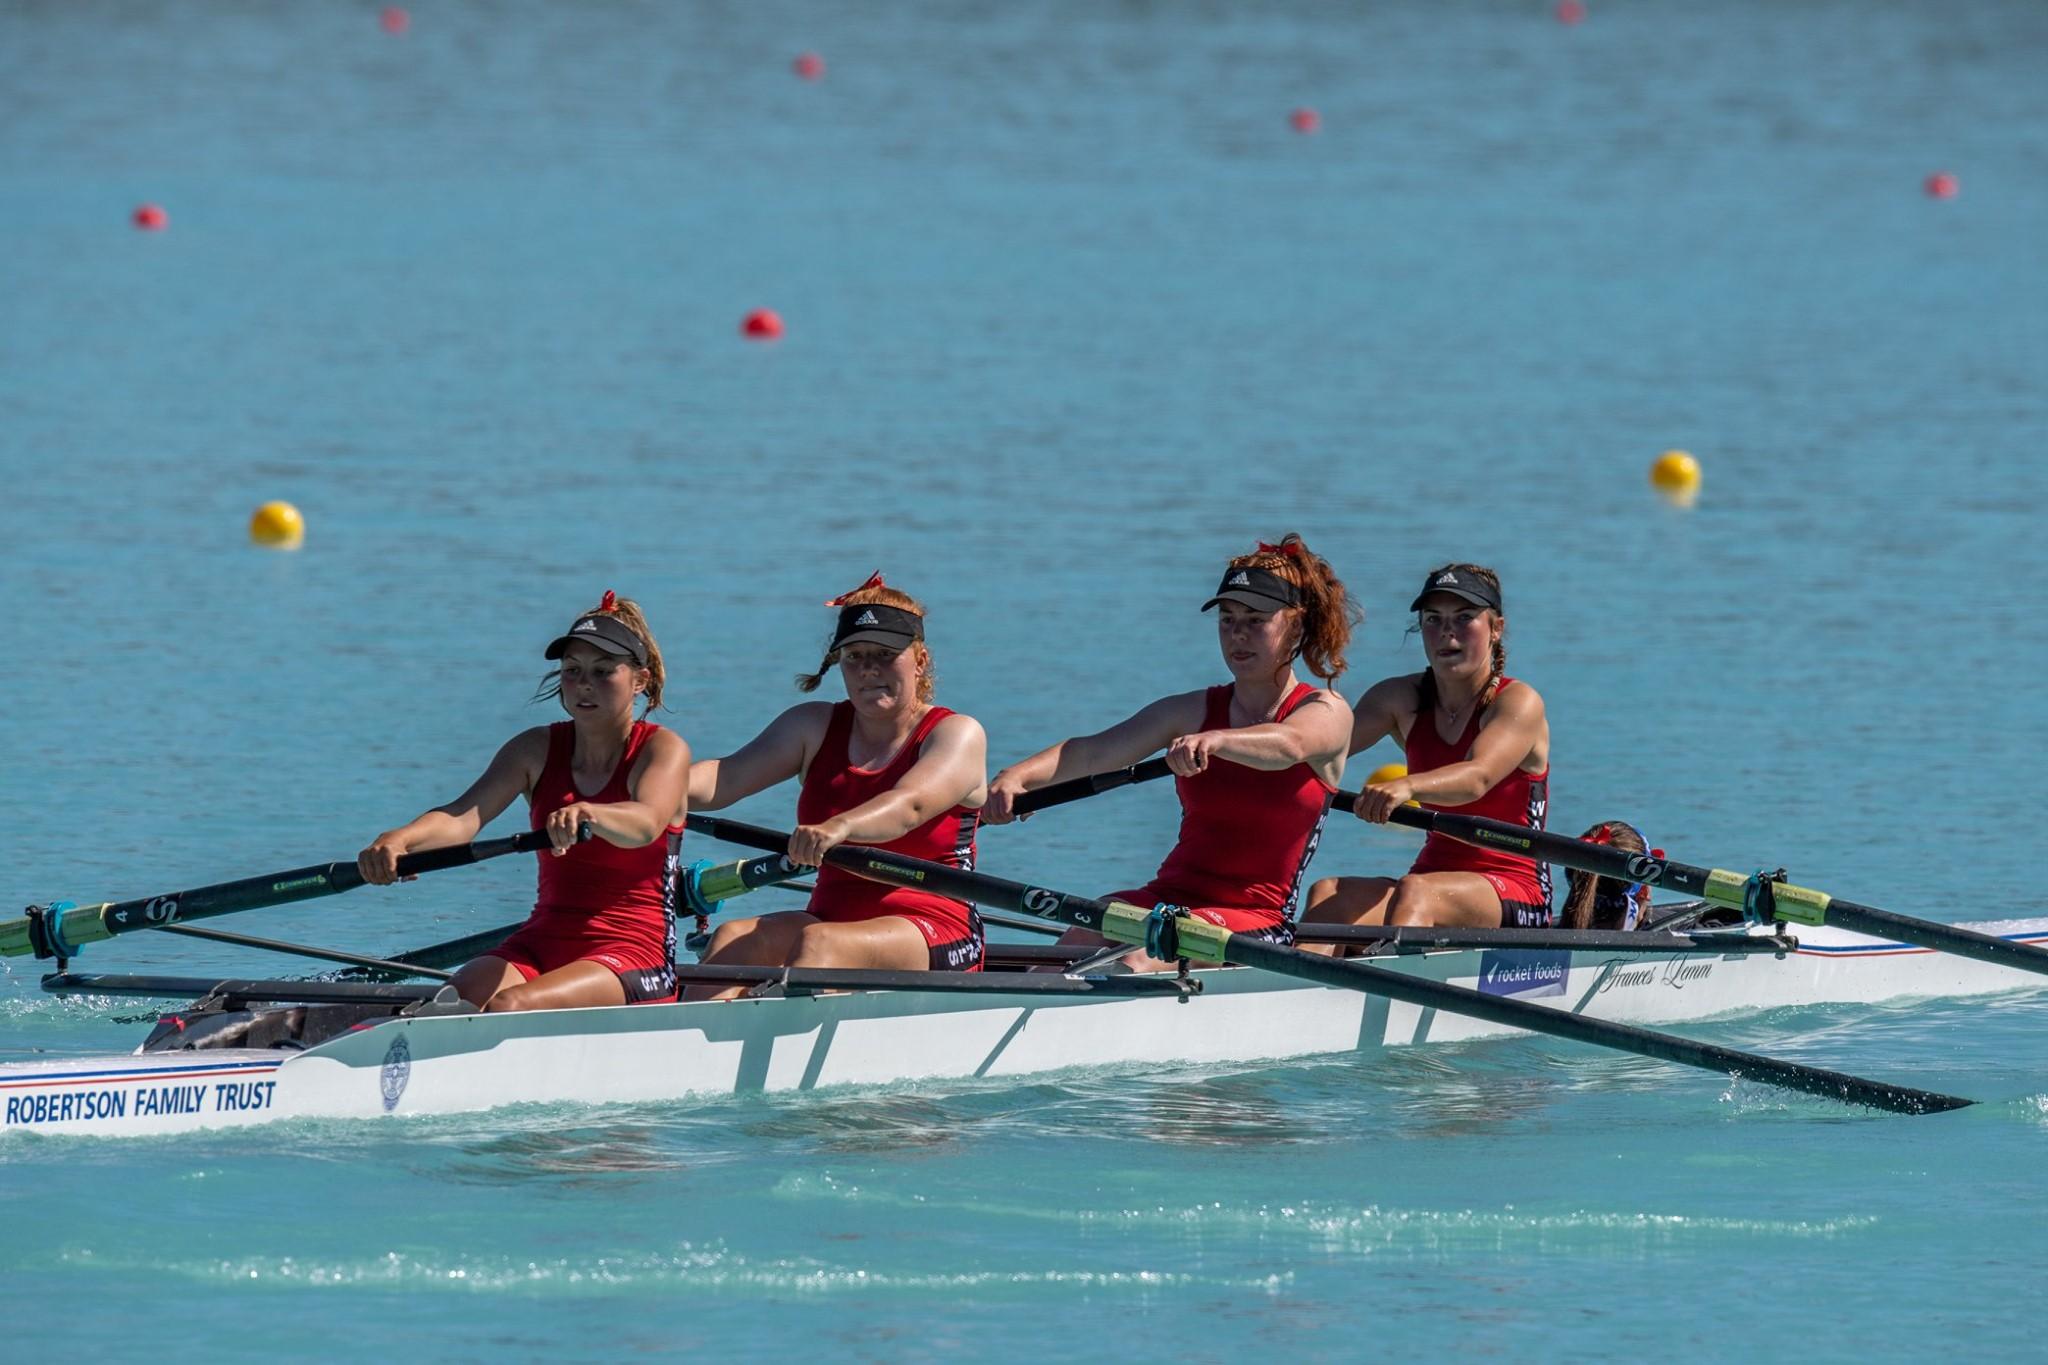 Waitaki Girls High rowing team on the water